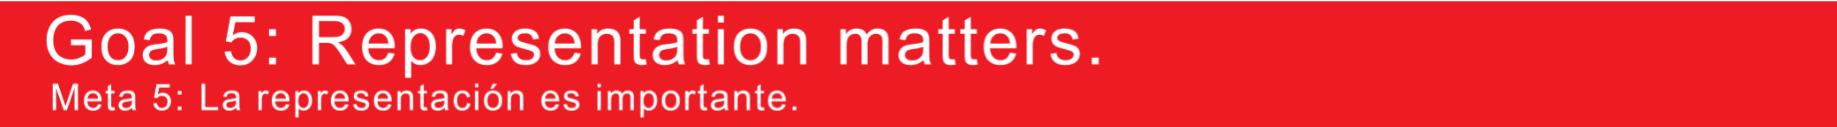 Red bar with text that links: Goal 5: Representation matters. / Meta 5: la representación es importante